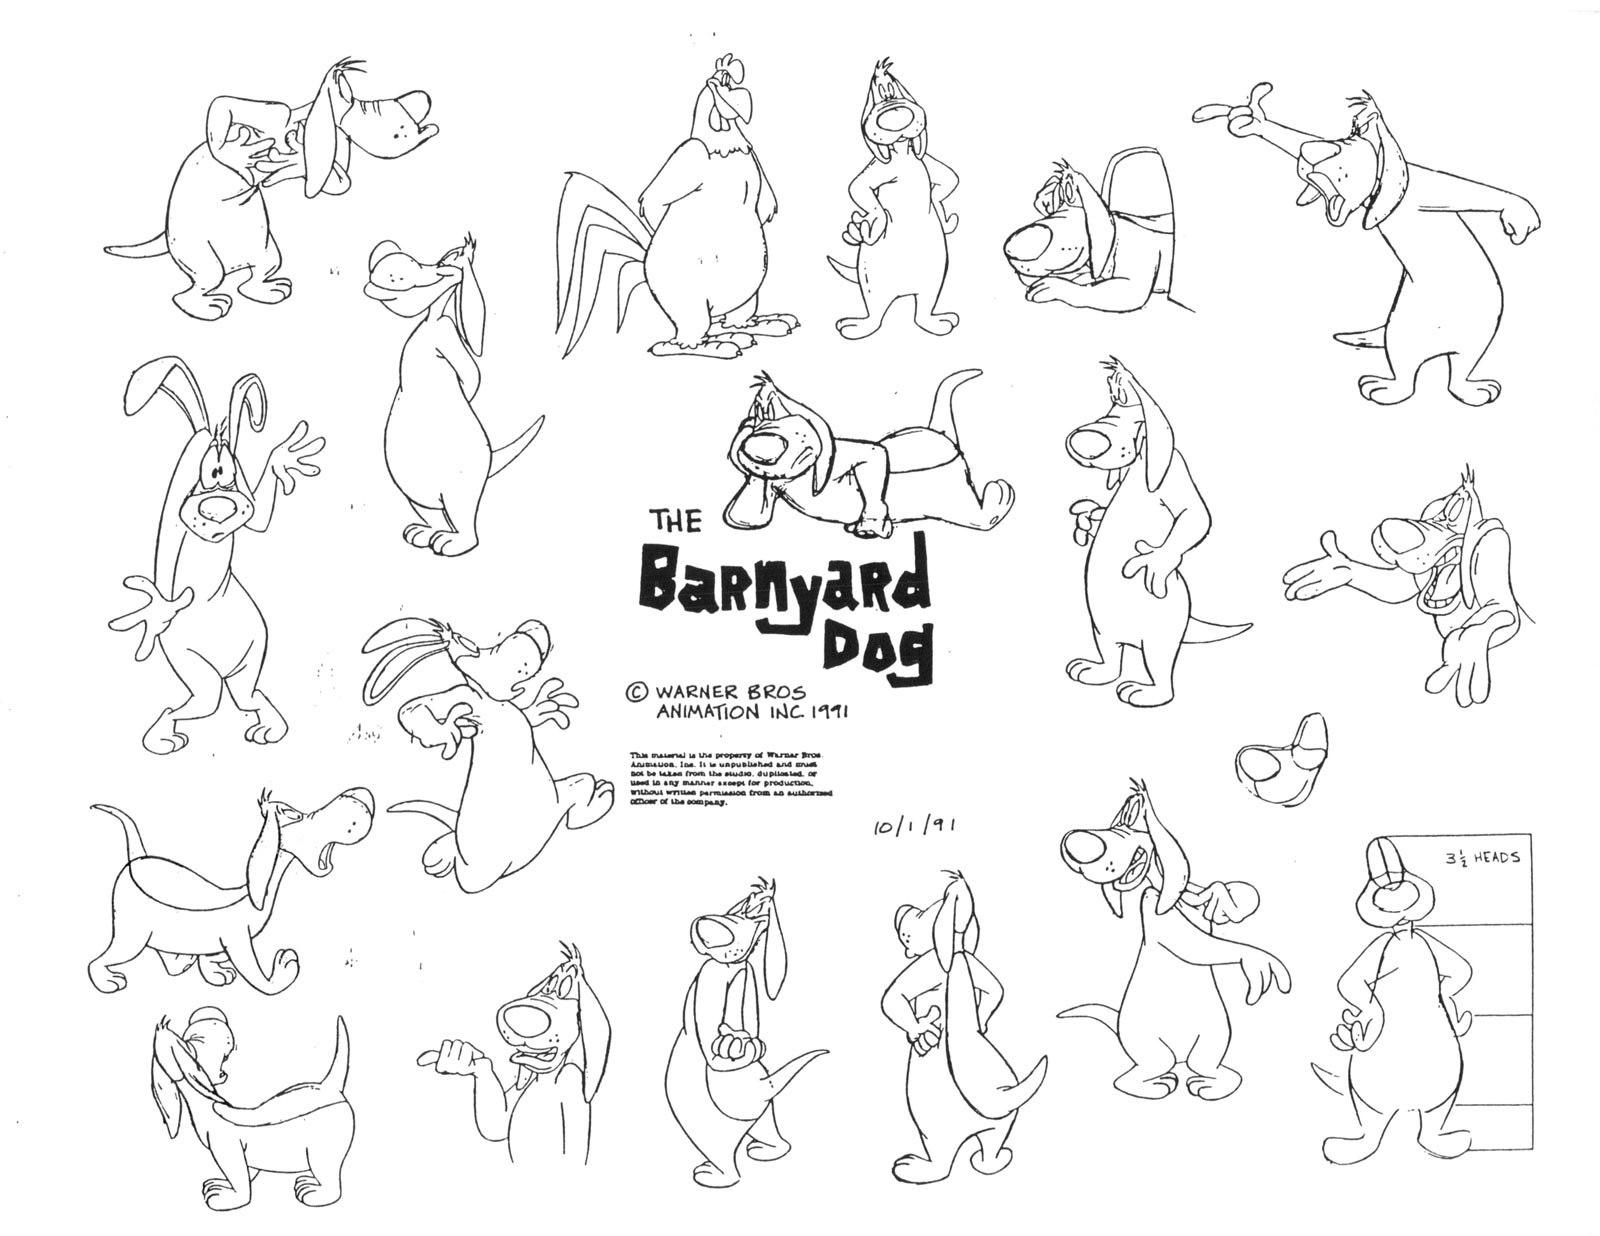 HD Quality Wallpaper | Collection: Cartoon, 1600x1236 Barnyard Dawg